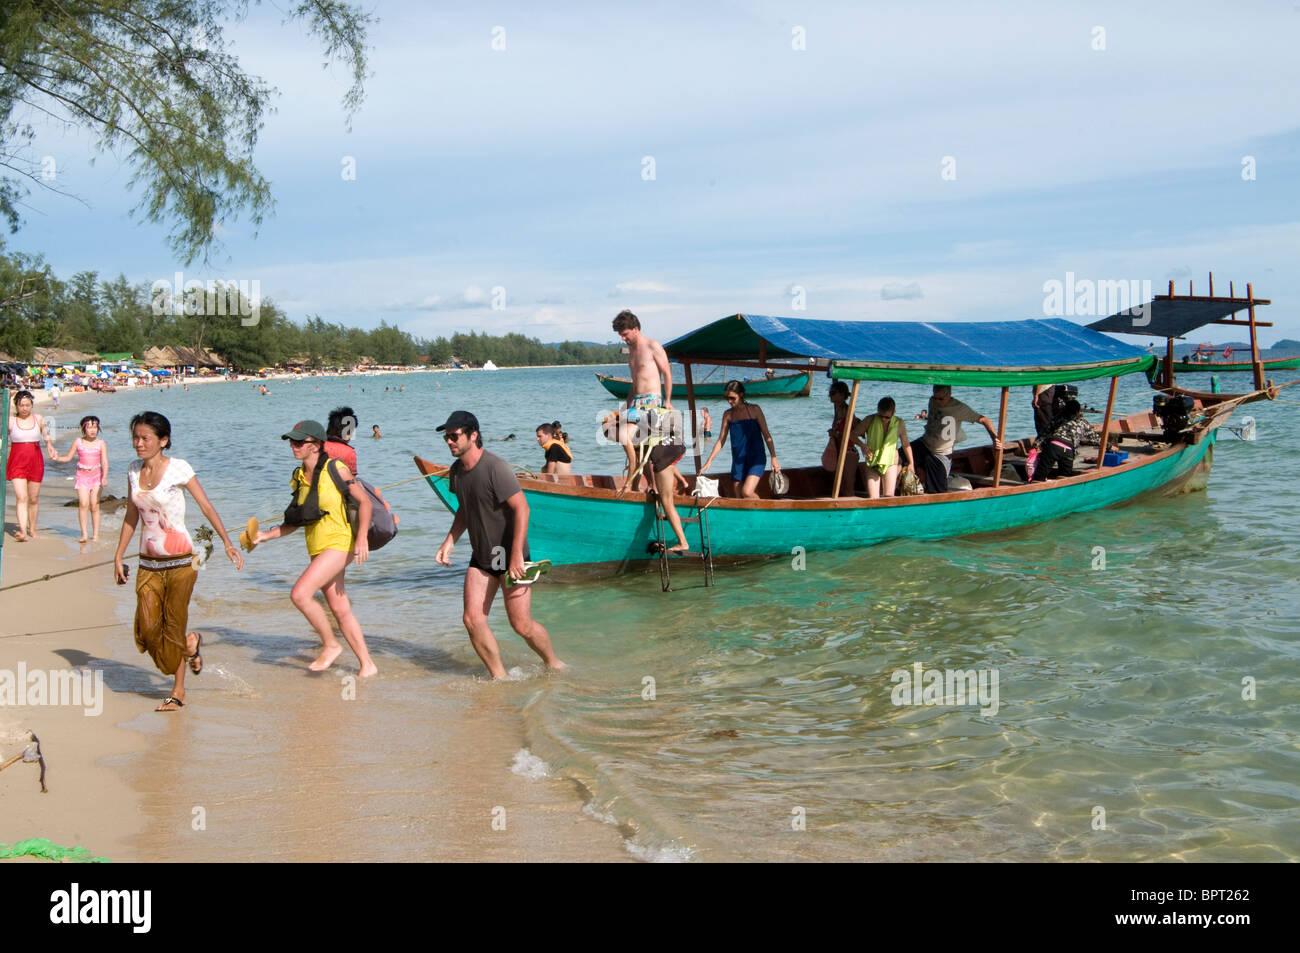 Tourist boat, Ocheateal Beach, Sihanoukville, Cambodia Stock Photo